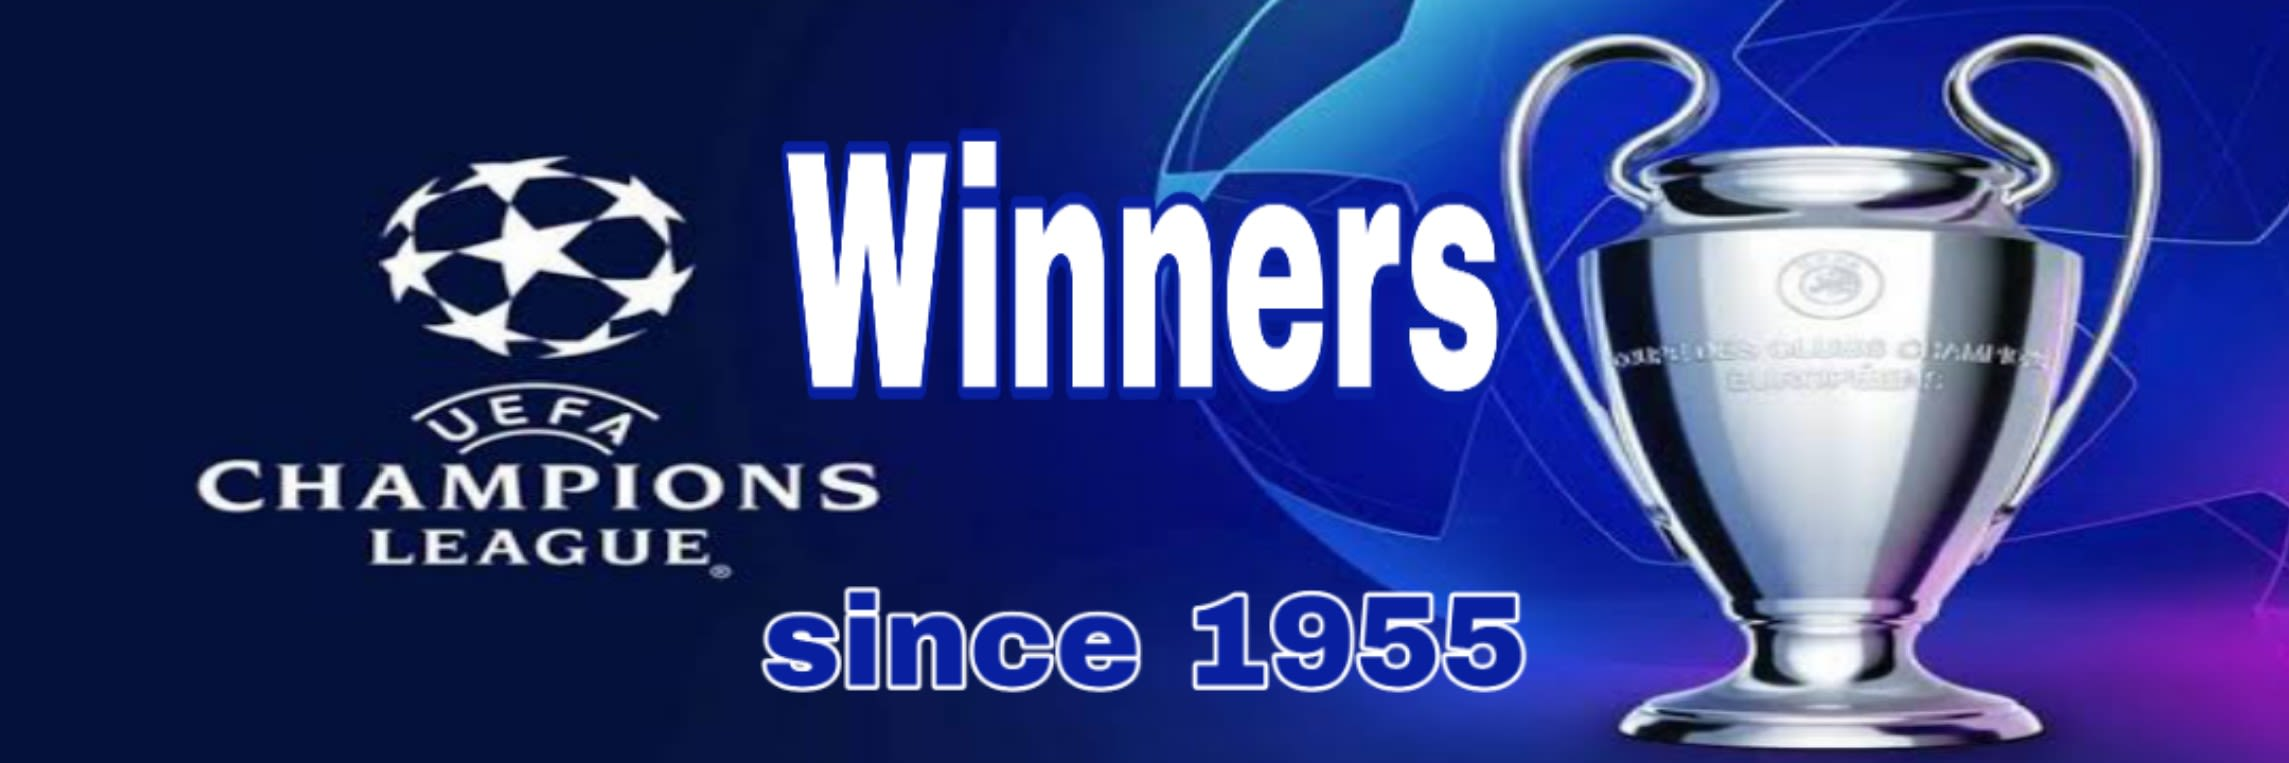 sportligatip football predictions and tips sportligatip football predictions and